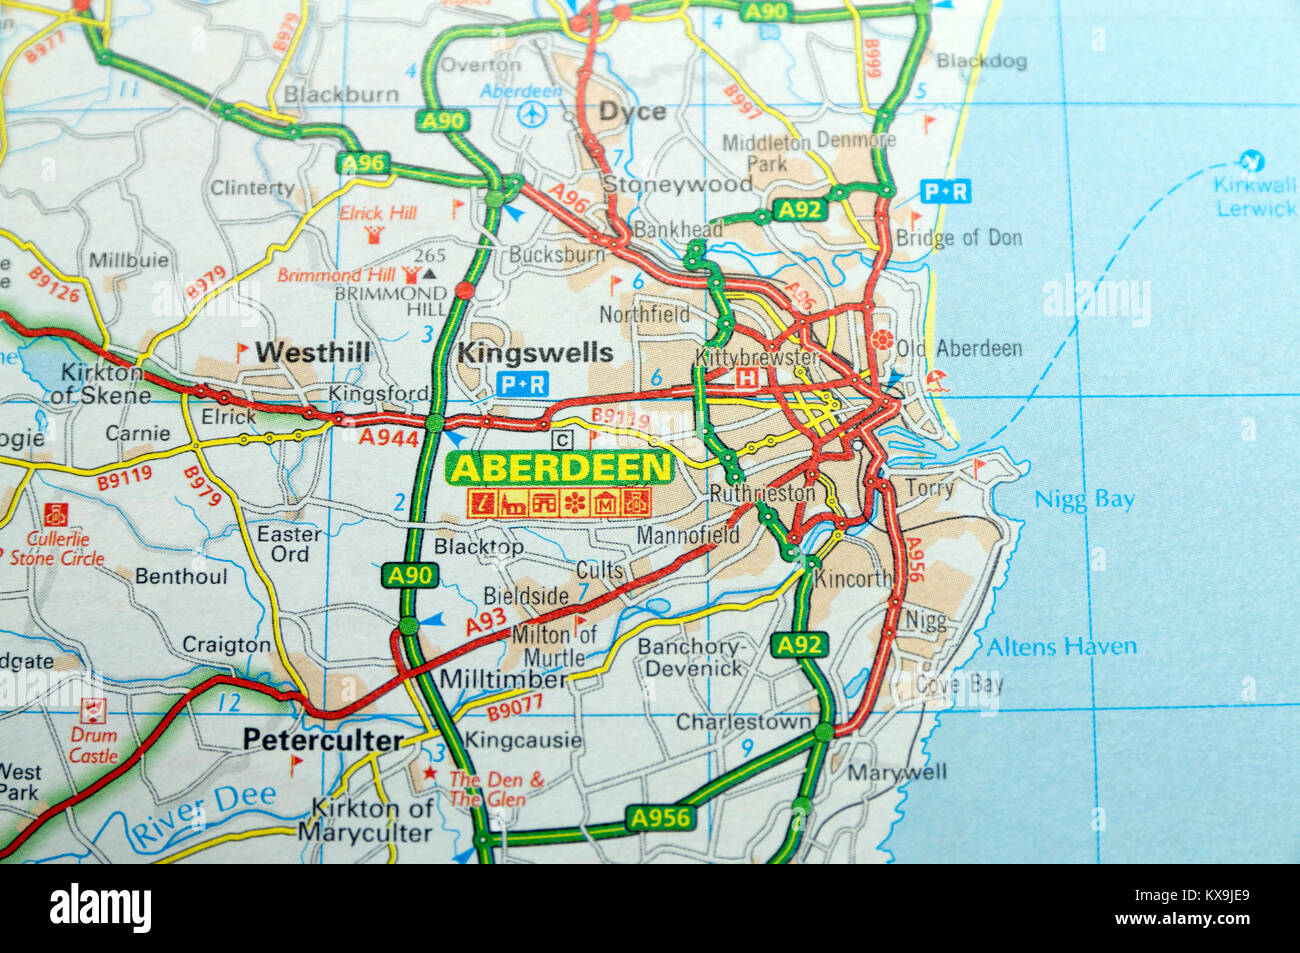 Road Map of Aberdeen, Scotland Stock Photo: 171086449 - Alamy